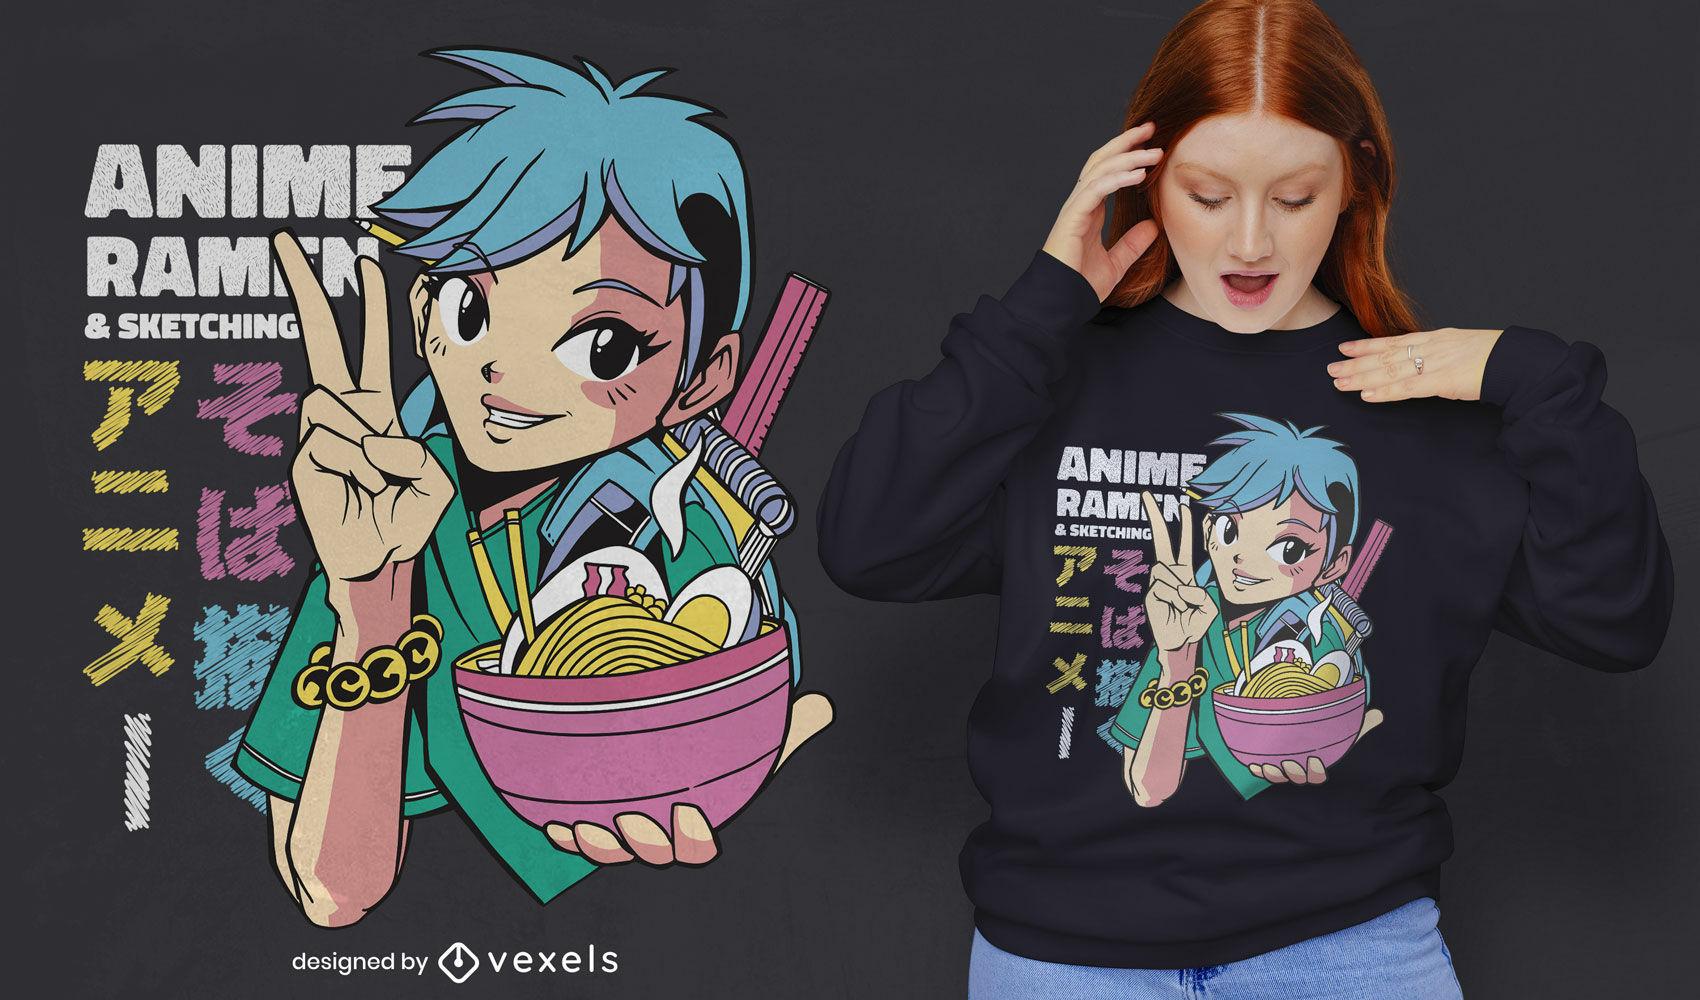 Anime girl with ramen bowl t-shirt design